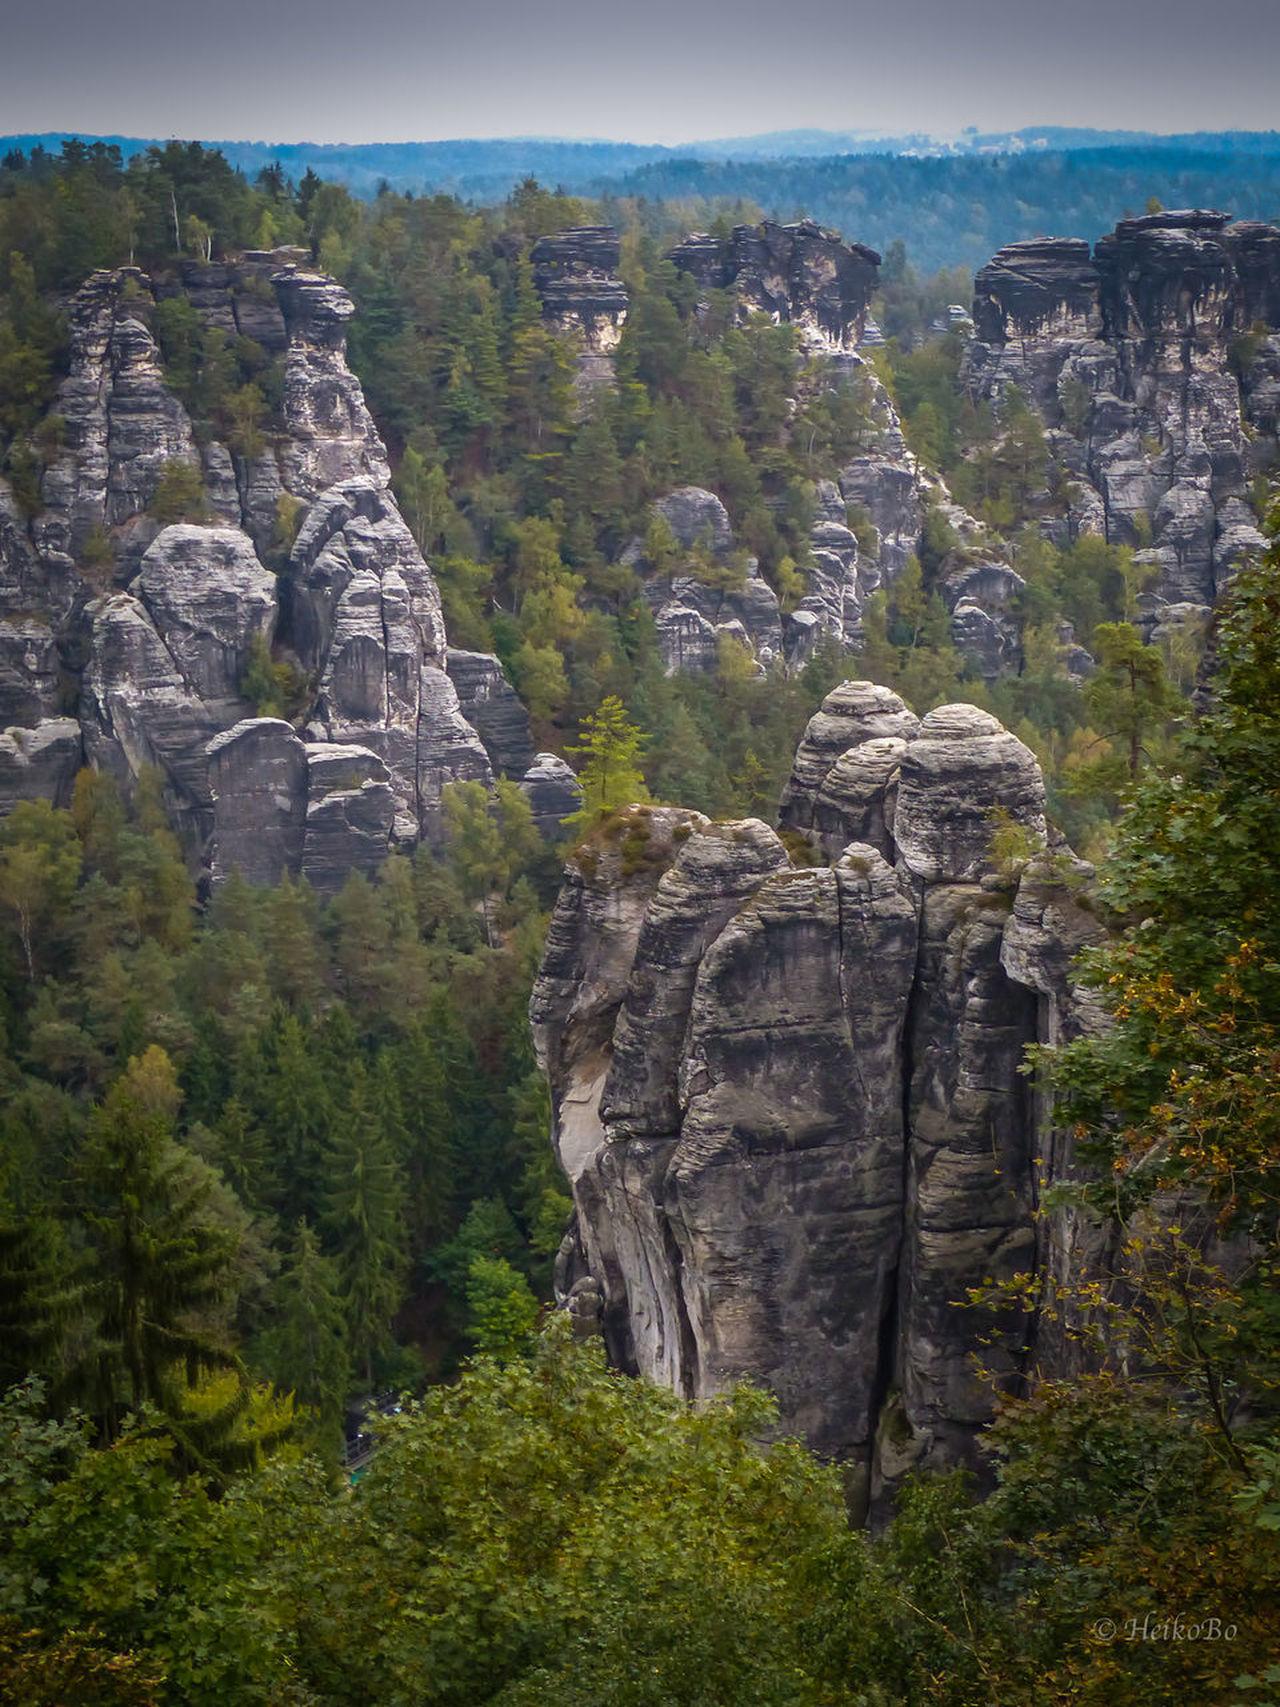 Elbsandsteingebirge Sächsischeschweiz Sächsische Schweiz Elbsandsteingebirge Sachsen Heikobo Foto